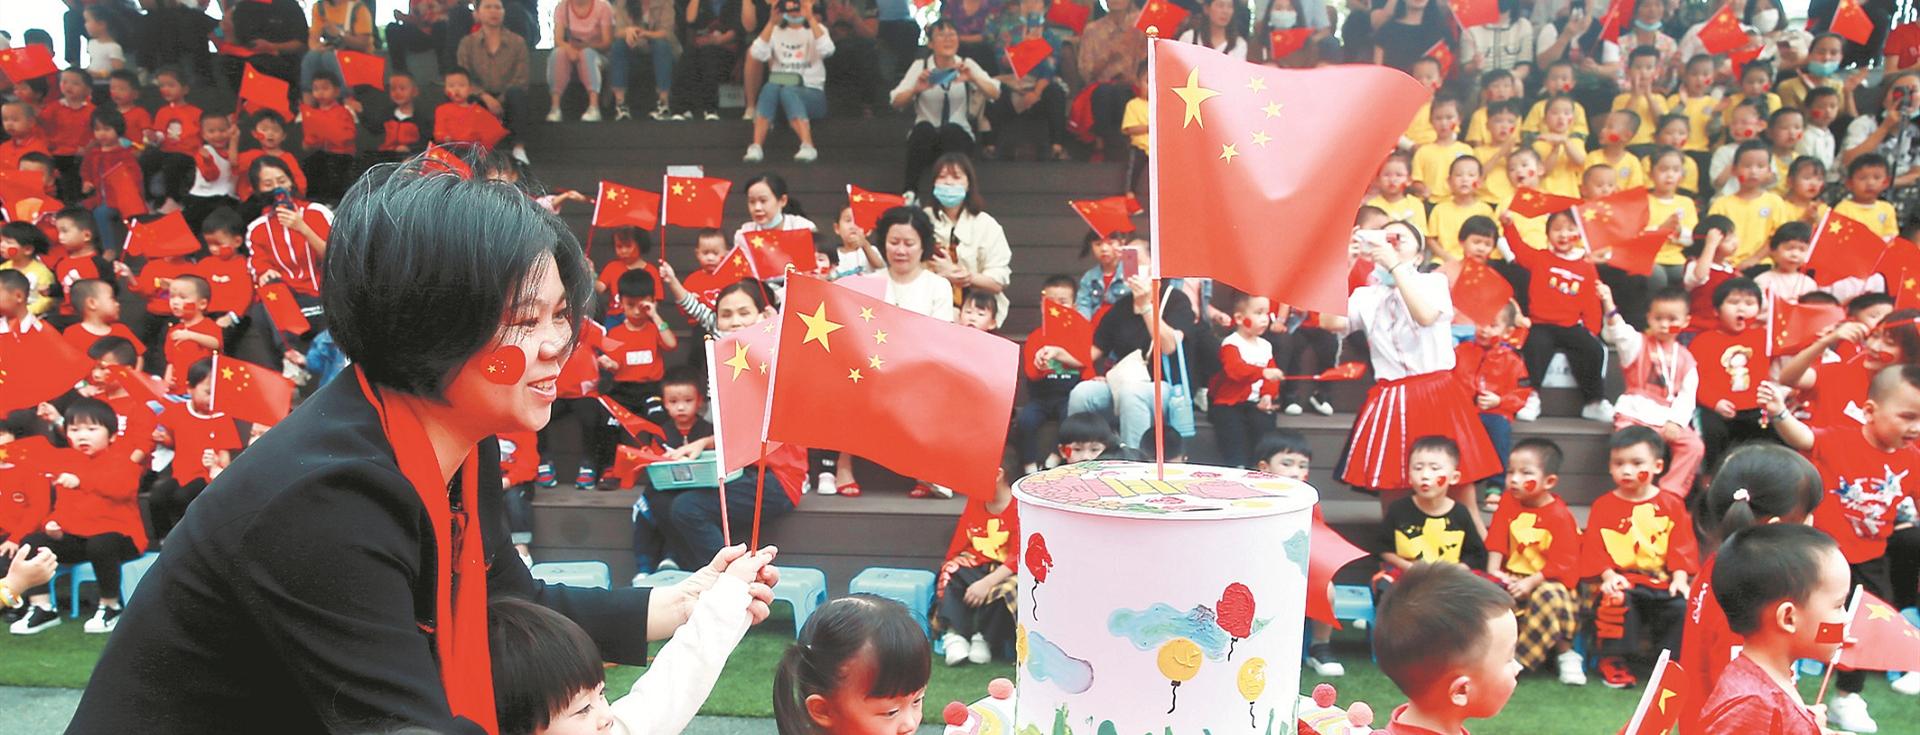 Quanzhou celebrates upcoming National Day